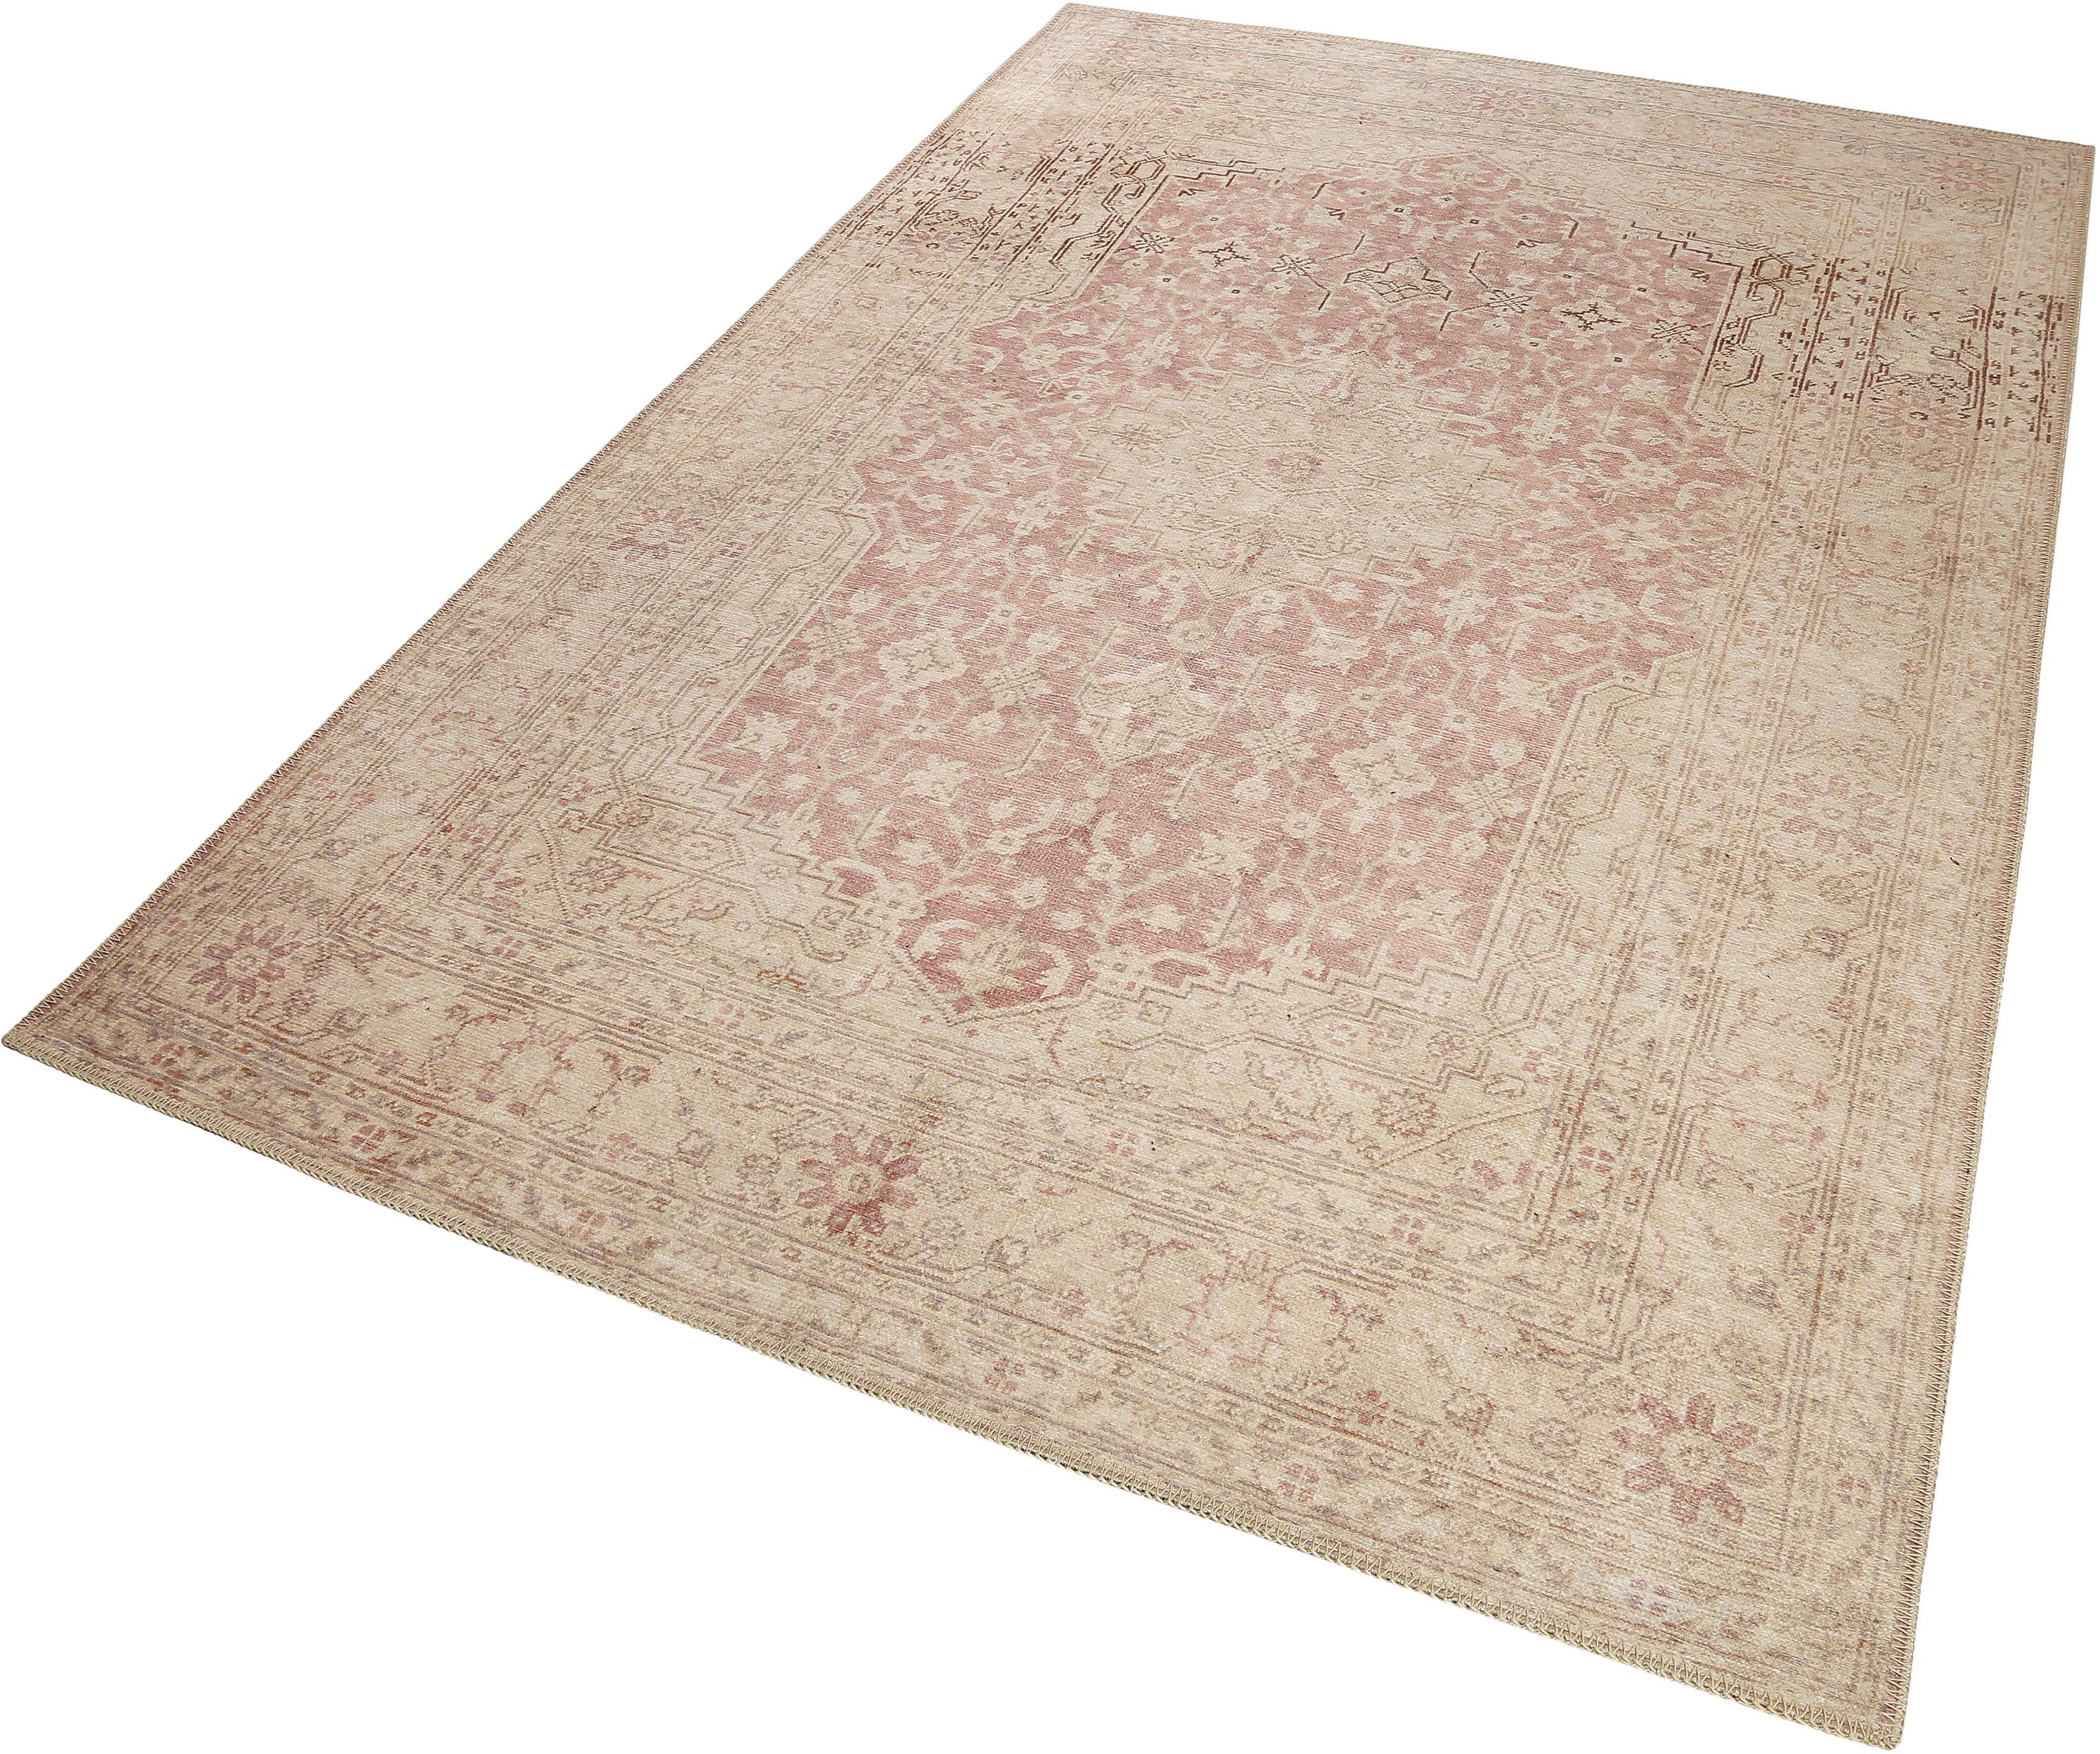 Teppich Past Future Wecon Home rechteckig Höhe 6 mm maschinell gewebt